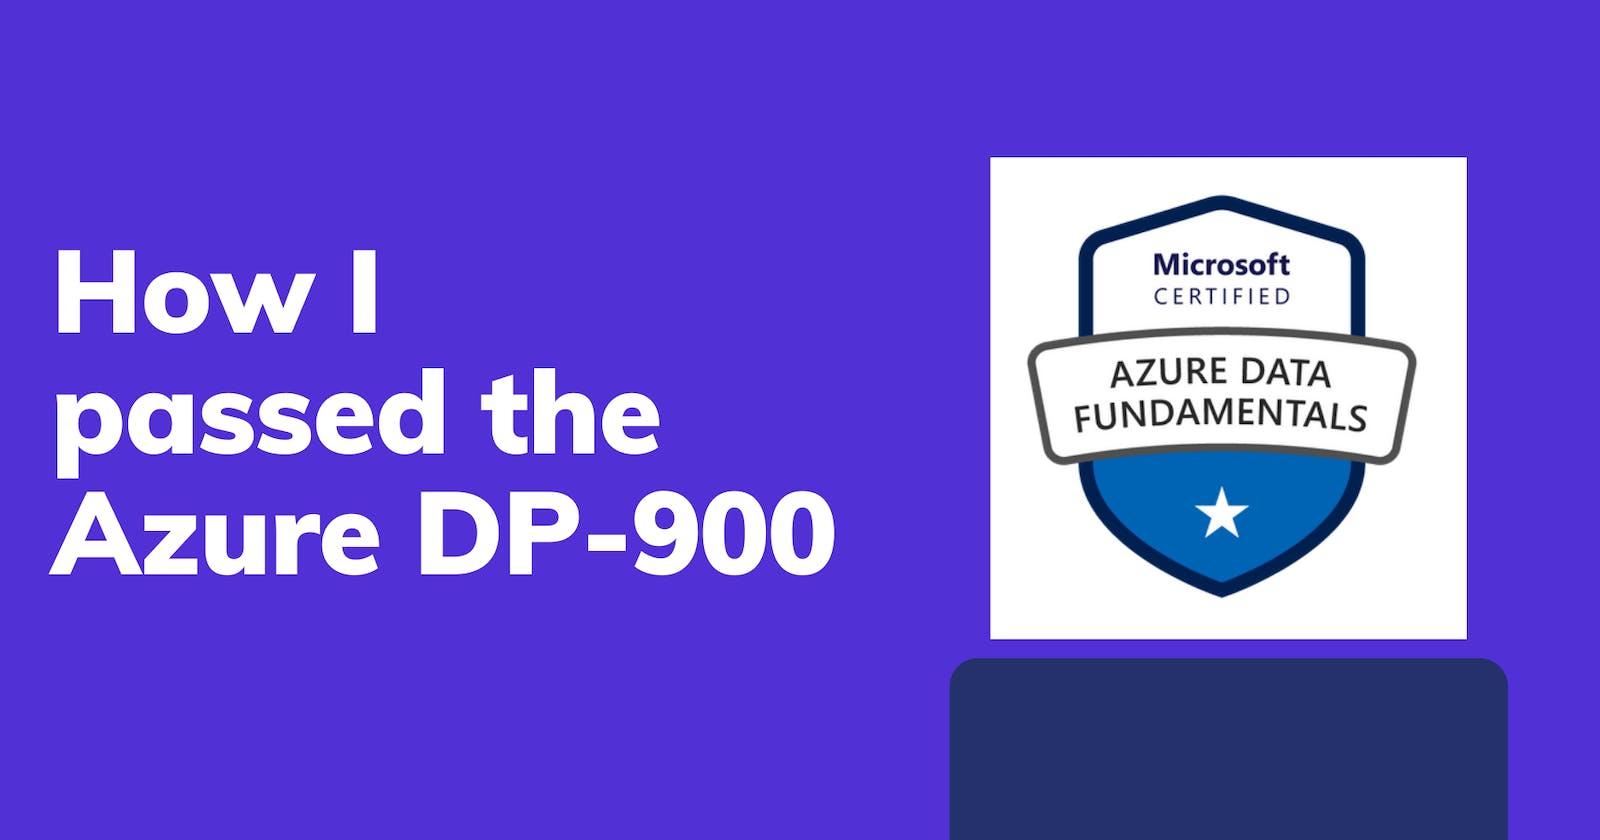 How I passed the Azure DP-900, Data Fundamentals exam